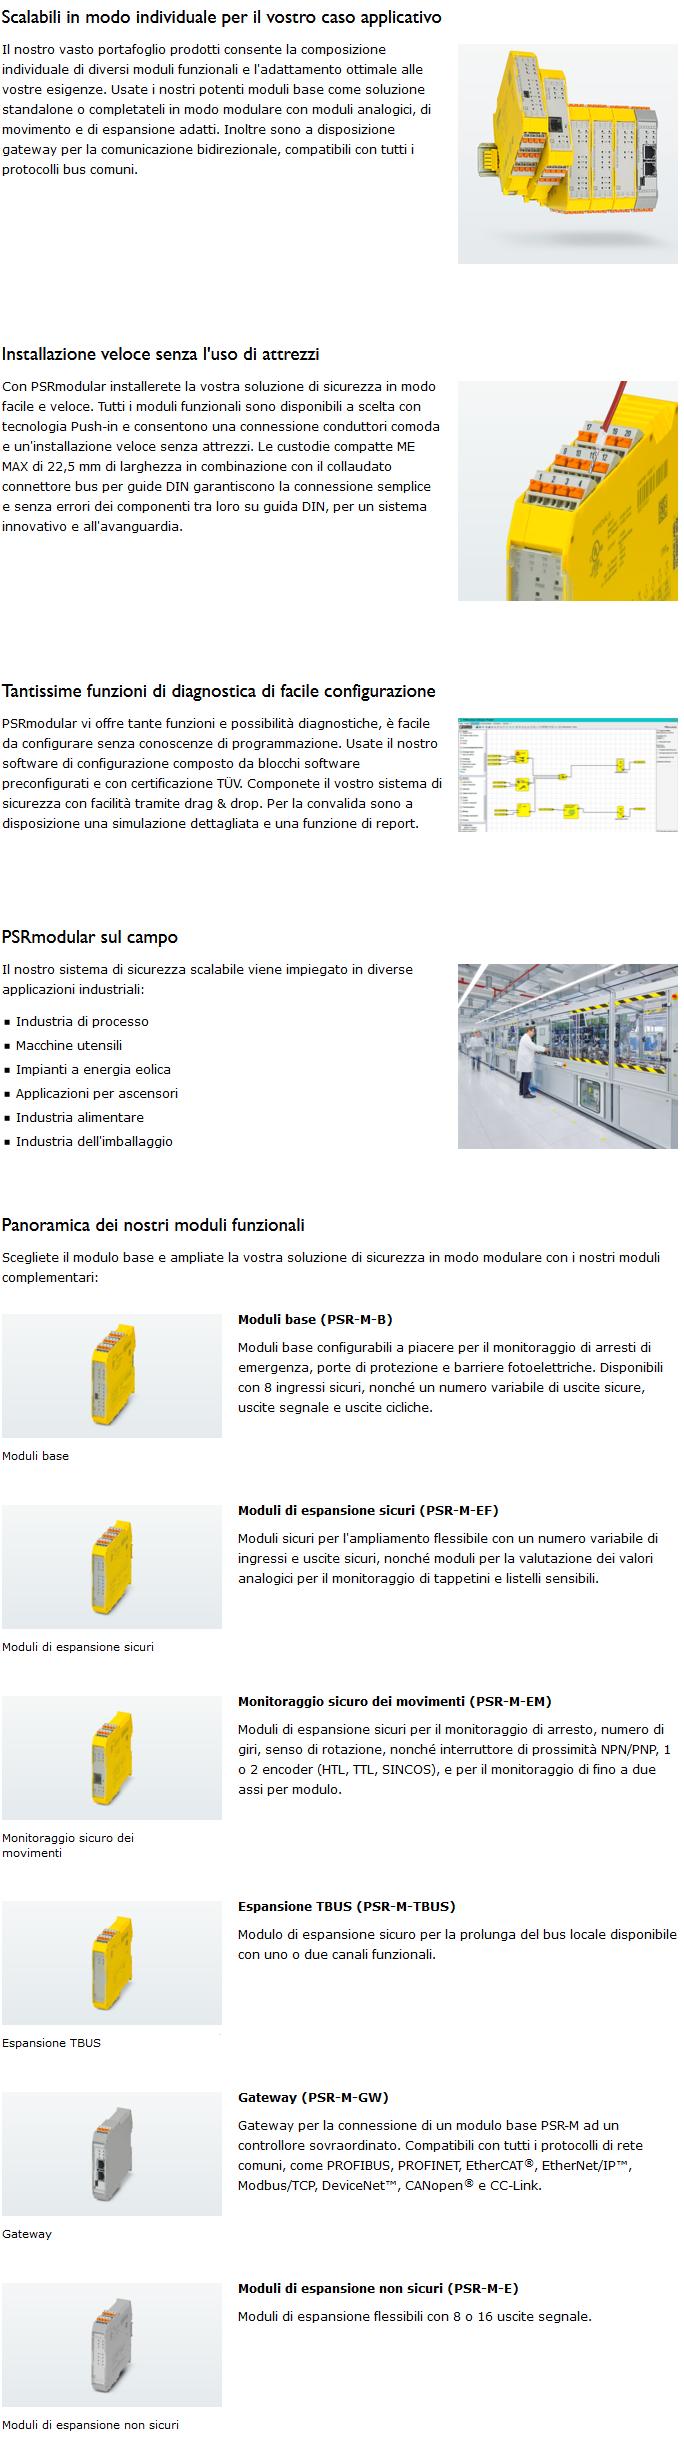 Screenshot_2020-04-14 Sistema di sicurezza PSRmodular